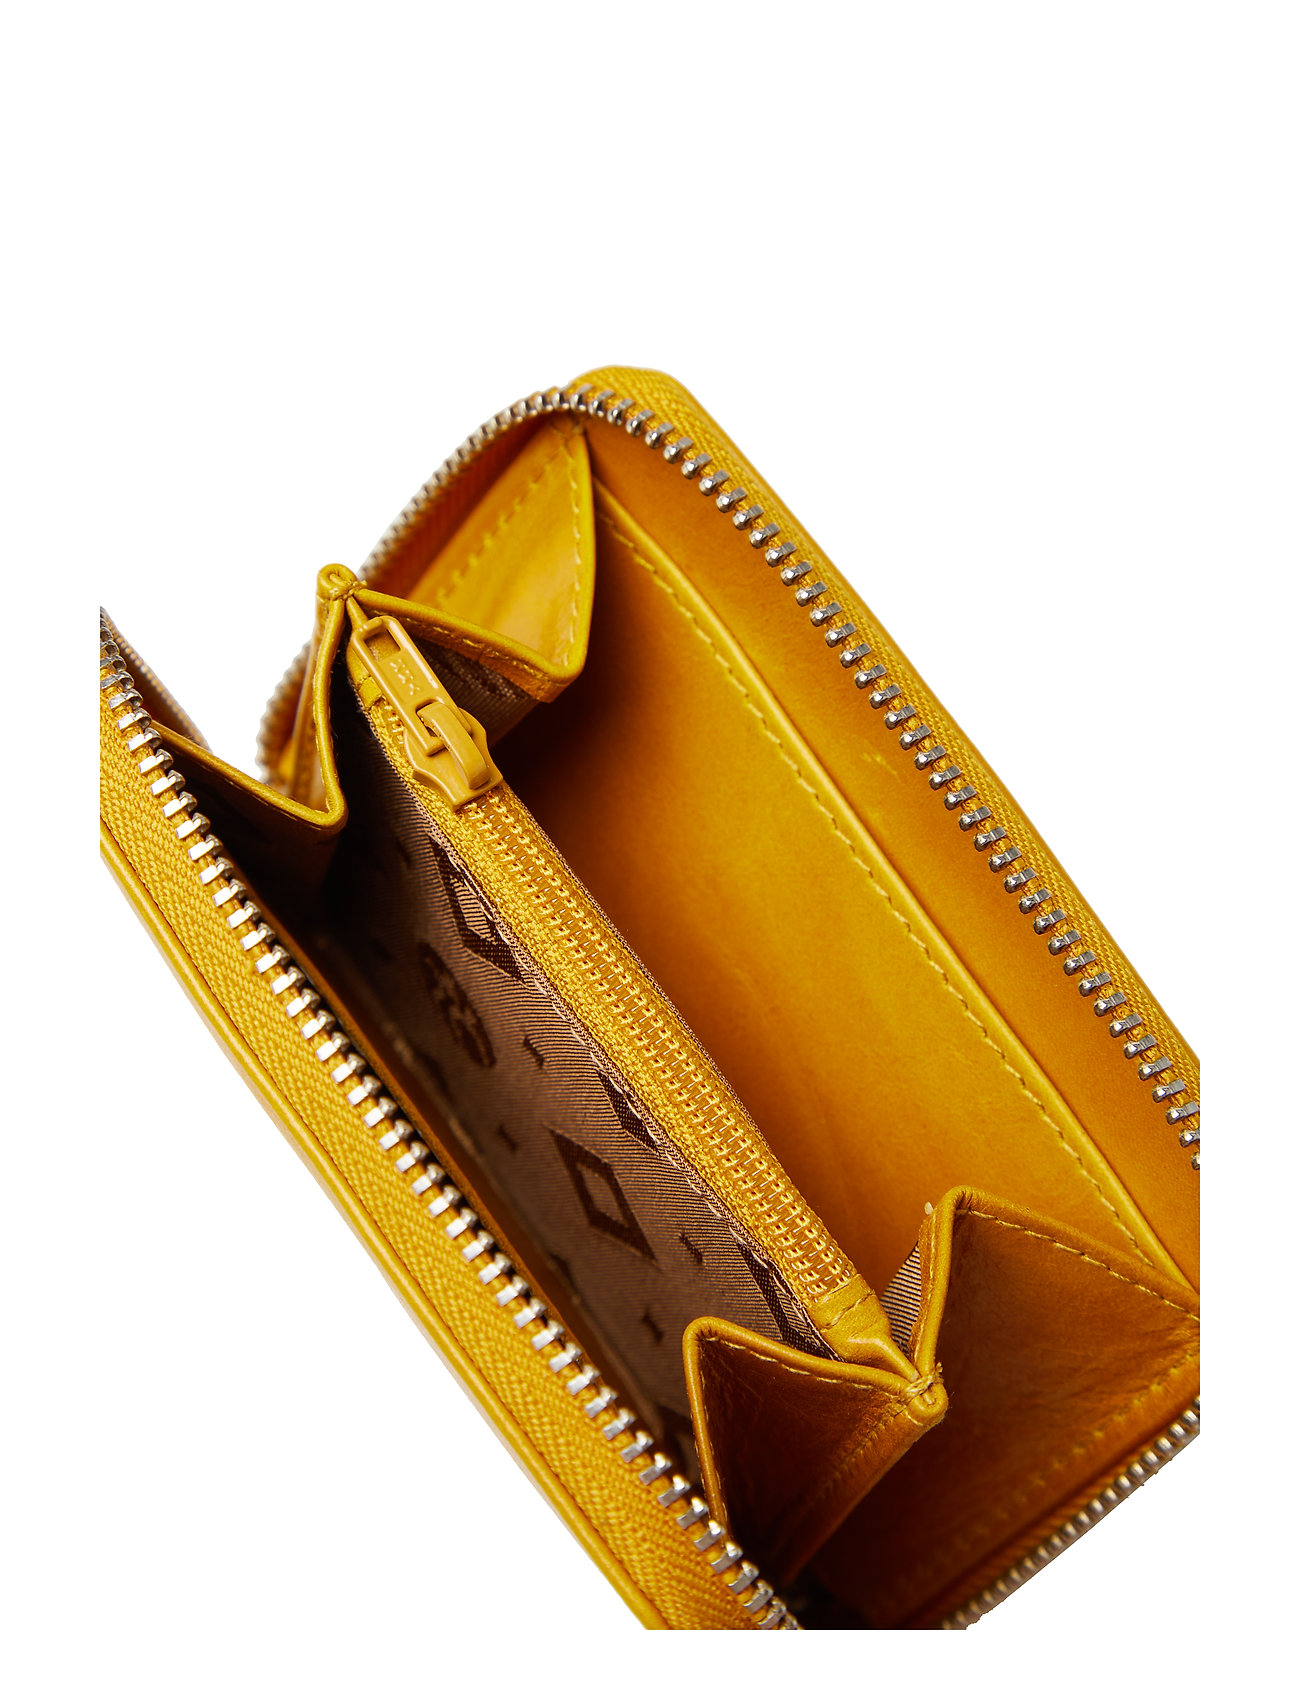 Salerno CorneliamustardAdax Salerno Wallet CorneliamustardAdax CorneliamustardAdax Wallet Wallet Salerno Wallet CorneliamustardAdax CorneliamustardAdax Wallet Salerno Salerno OXkZTPiu